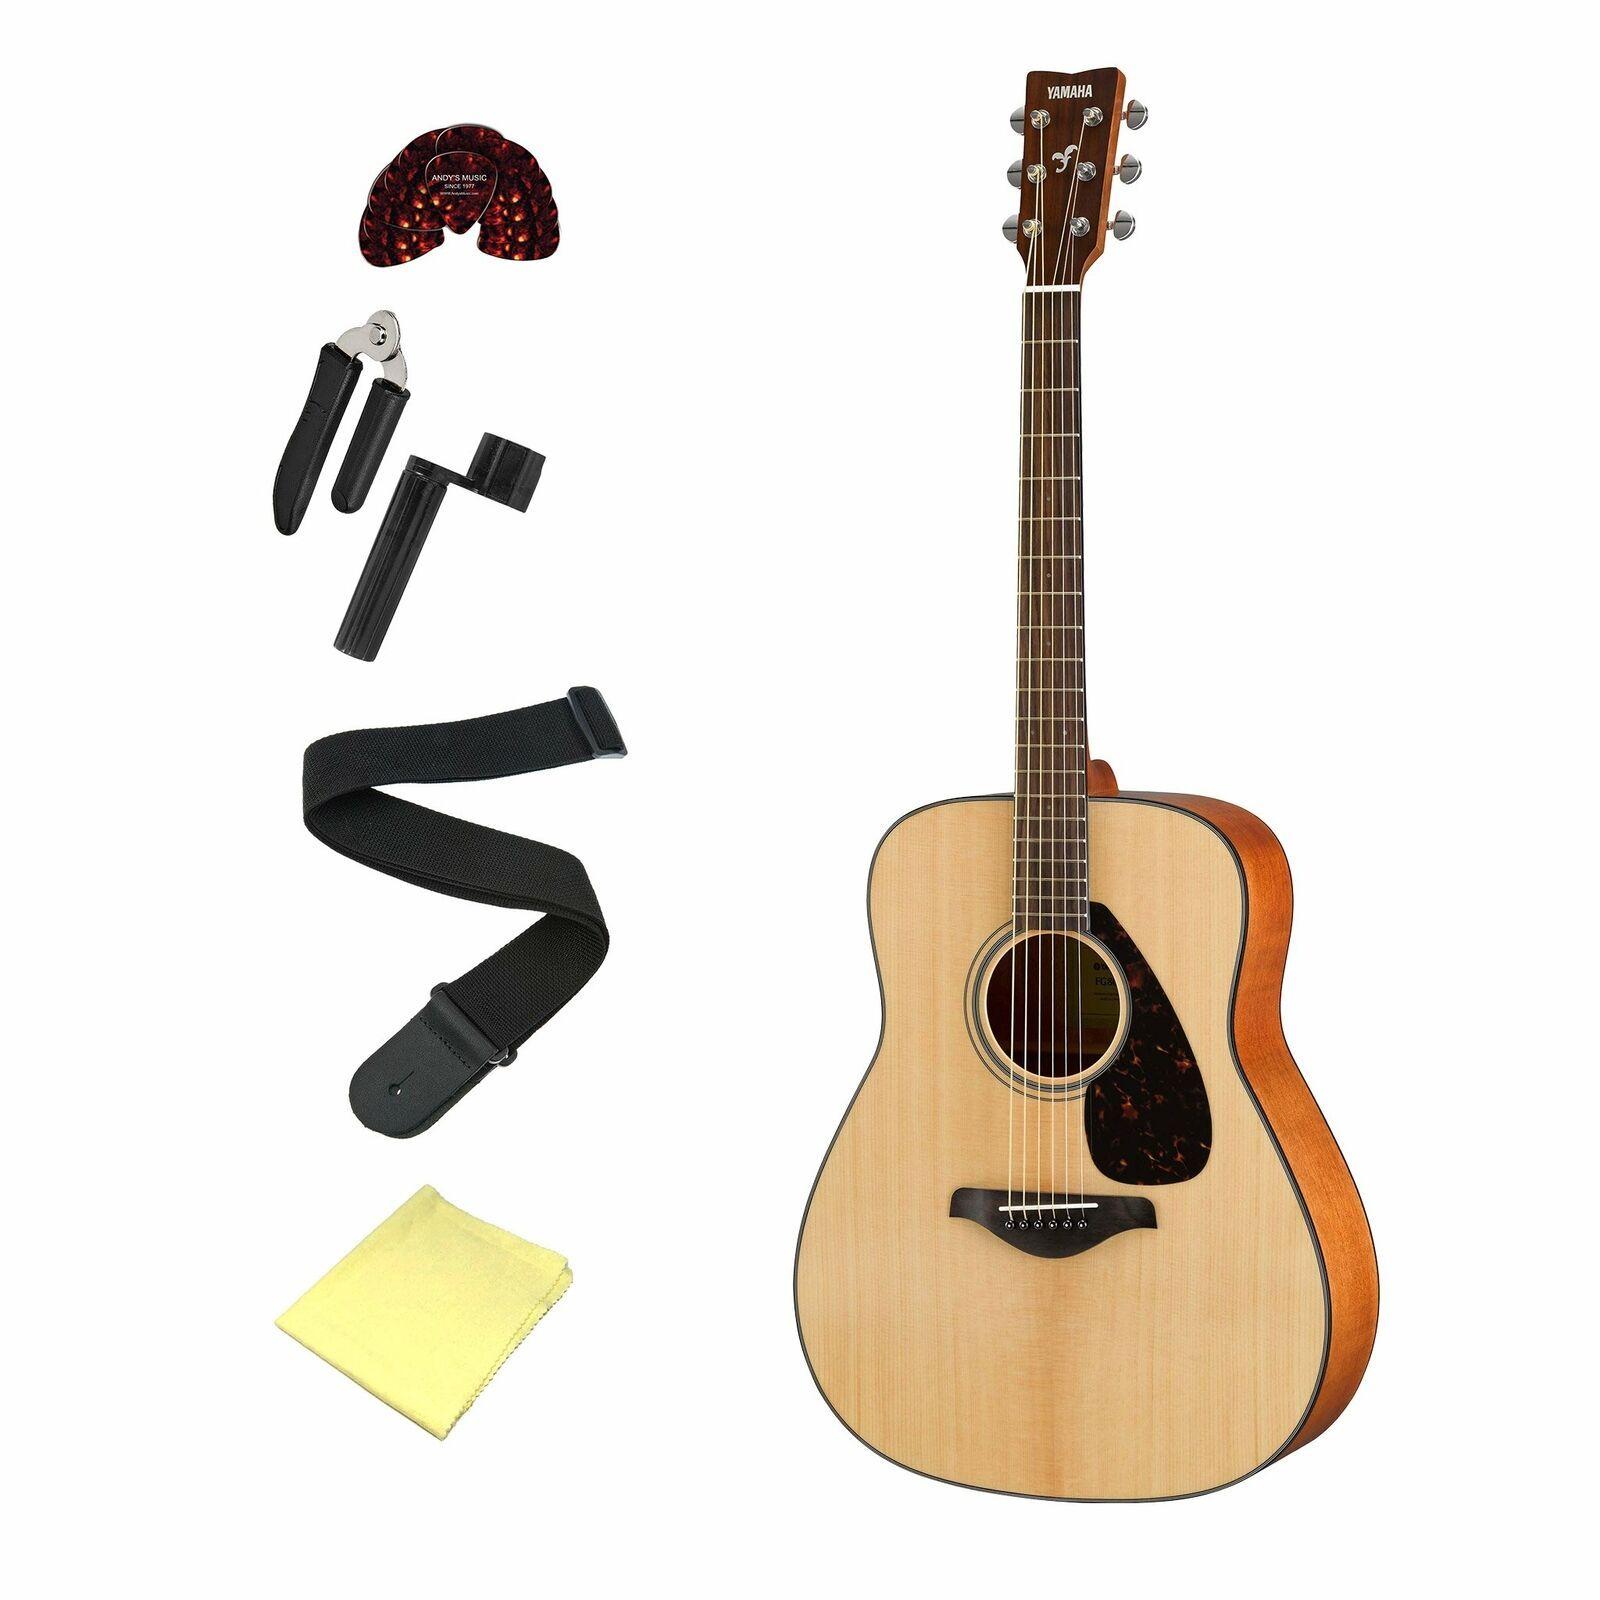 Yamaha Fg800m Matte Finished Acoustic Guitar Bundle Select Your Bundle Acoustic Guitar Ideas Of Acoustic Guitar Acousticguita Acoustic Guitar Guitar Acoustic Guitar Case